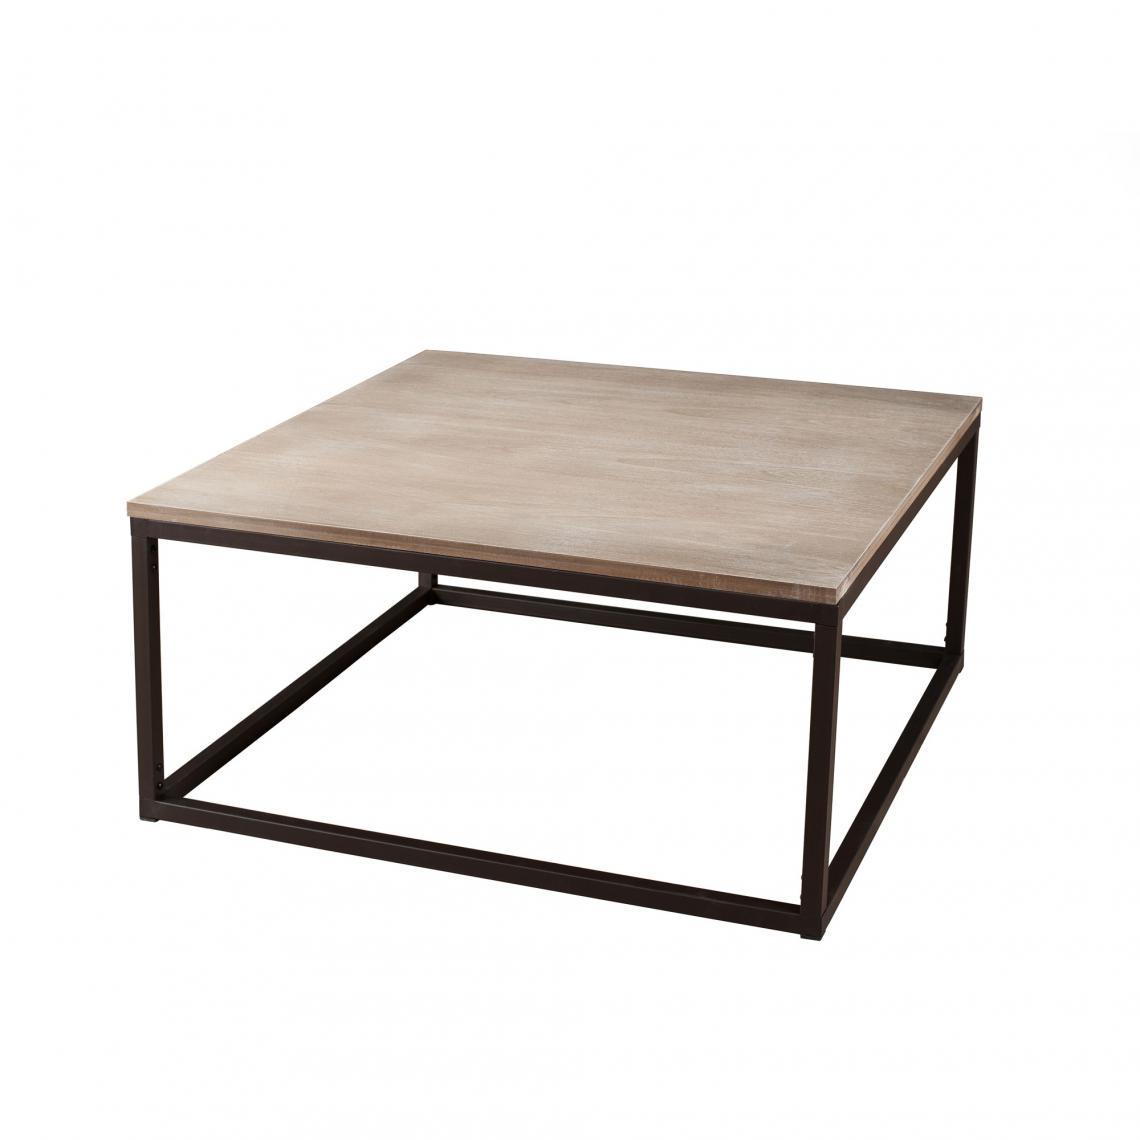 Table style 90 basse x cm industriel carrée 90 Bois b6gyIYf7v